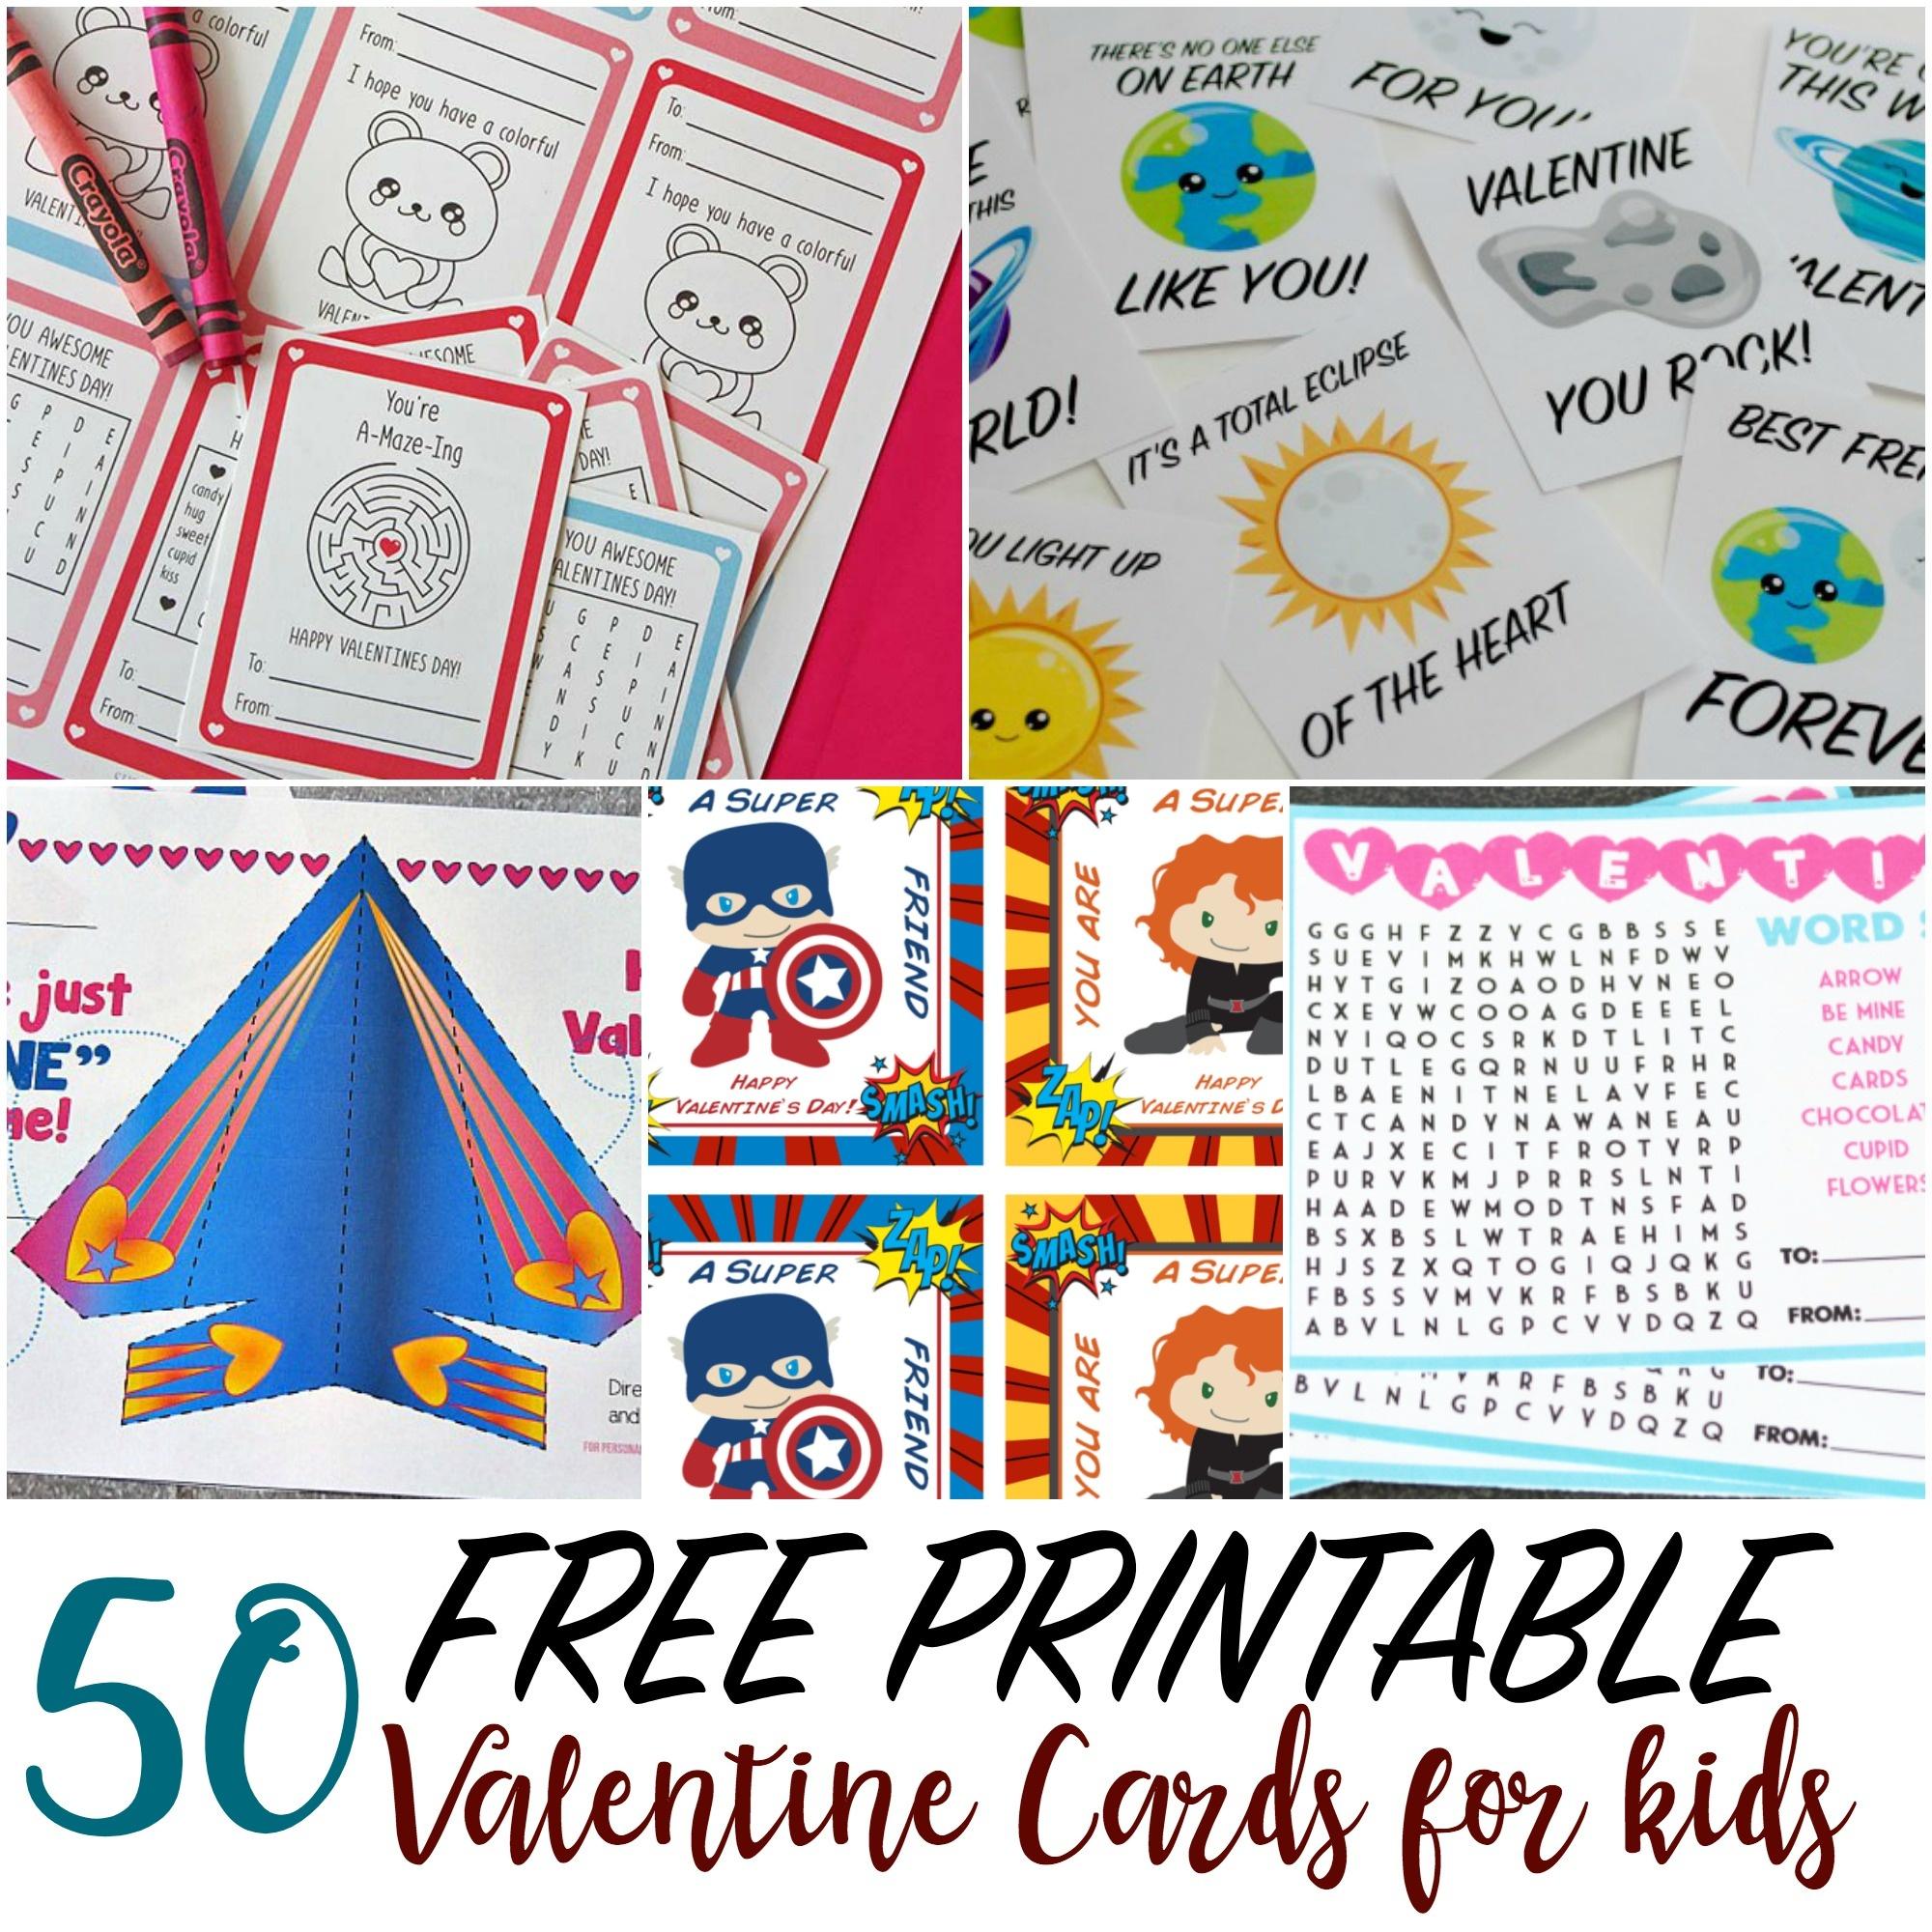 50 Printable Valentine Cards For Kids - Free Printable Valentines For Kids